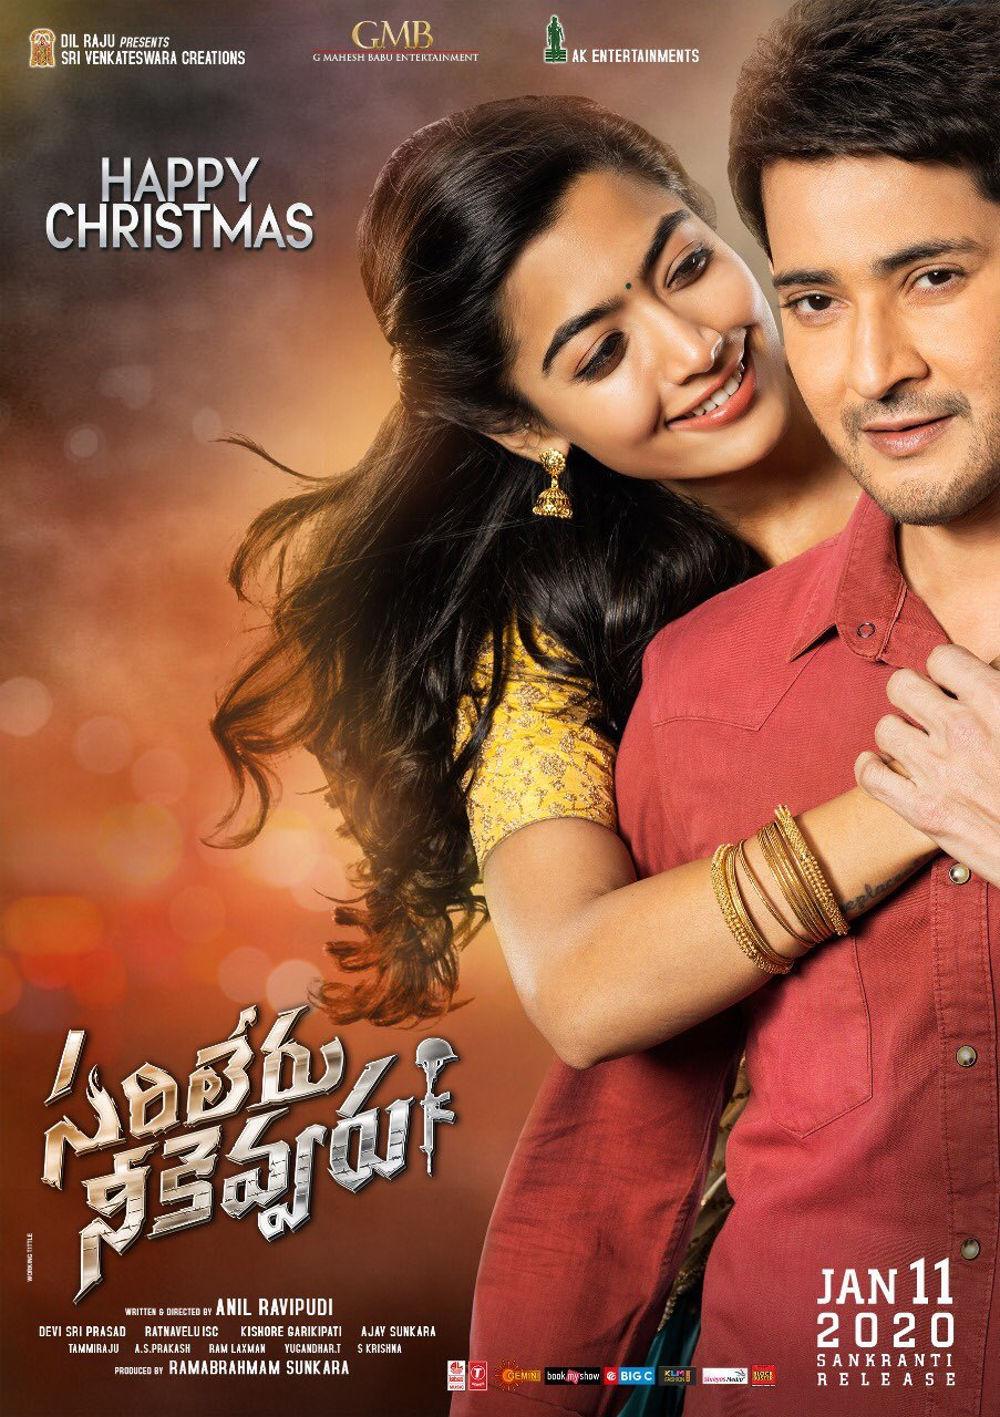 Rashmika Mandanna Mahesh Babu Sarileru Neekevvaru Christmas Wishes Poster HD